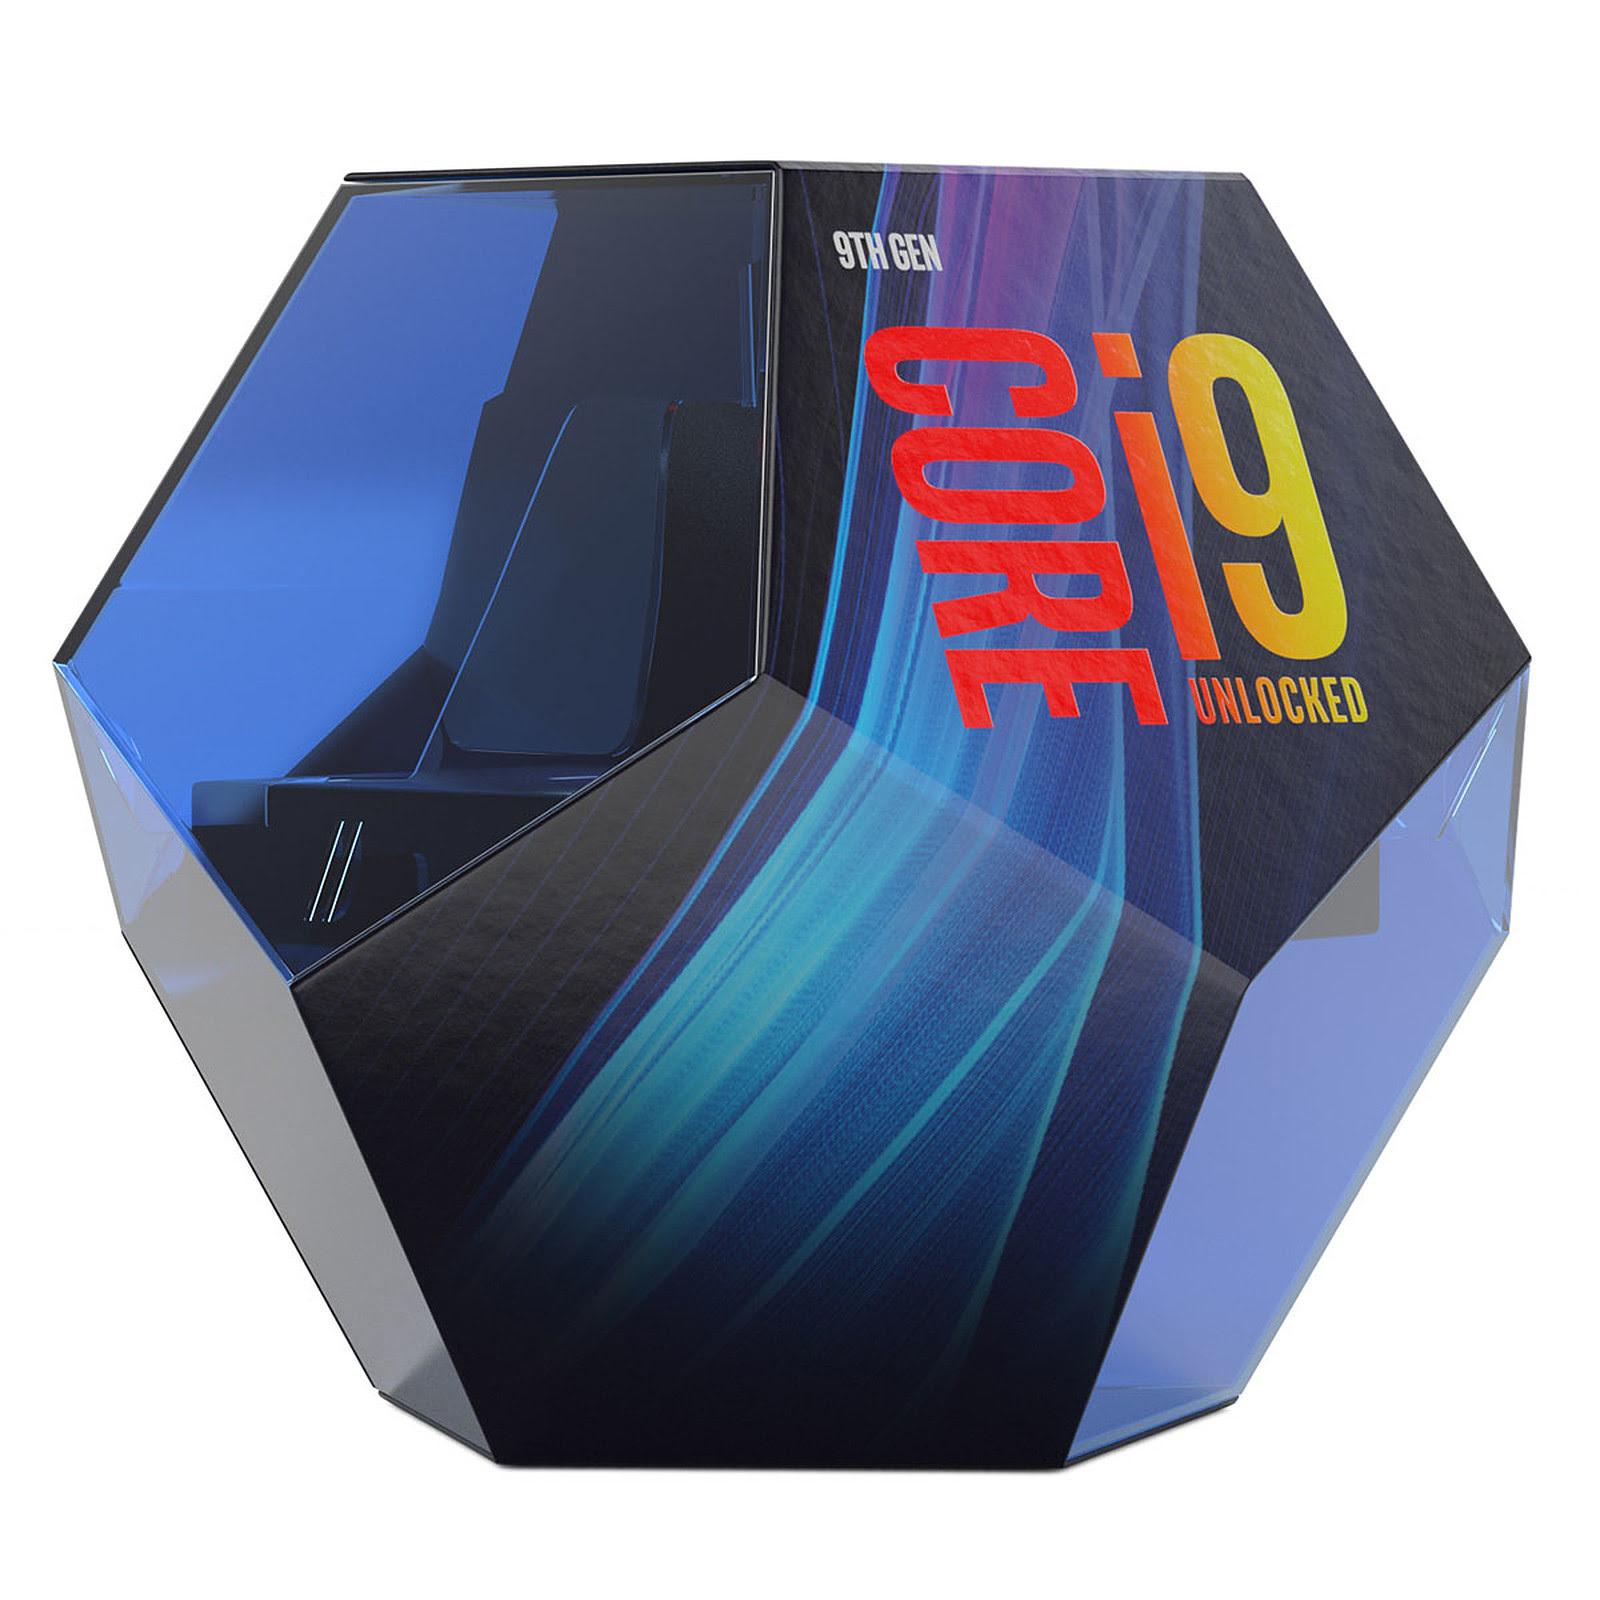 Intel Core i9-9900KS - 3.6GHz/LGA1151(2017)/Ss Vent./BOX (BX80684I99900KS) - Achat / Vente Processeur sur Cybertek.fr - 0